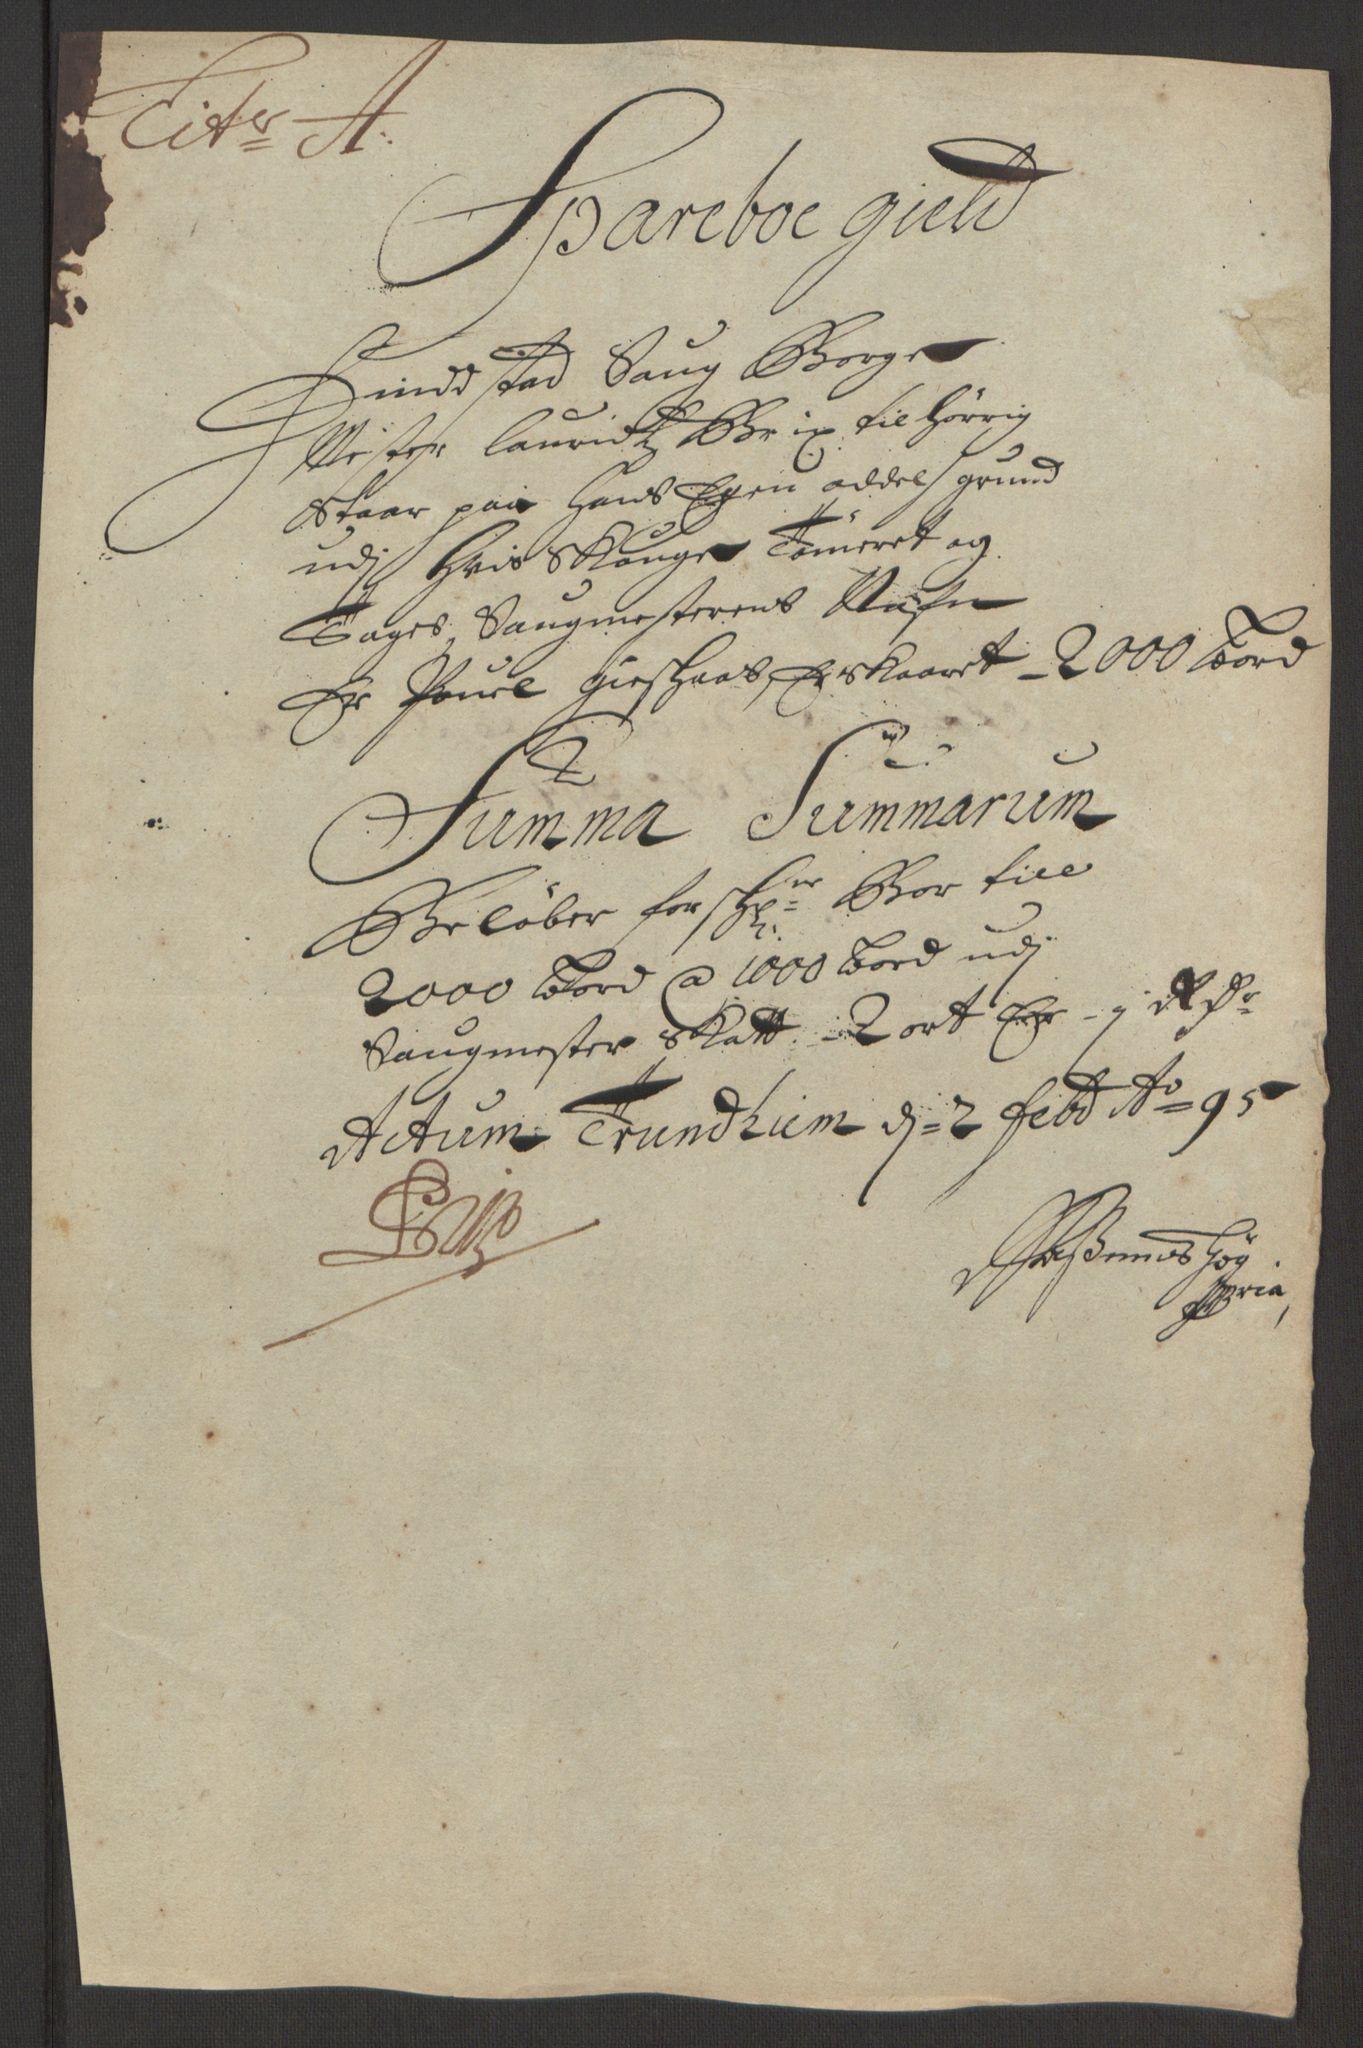 RA, Rentekammeret inntil 1814, Reviderte regnskaper, Fogderegnskap, R63/L4308: Fogderegnskap Inderøy, 1692-1694, s. 531